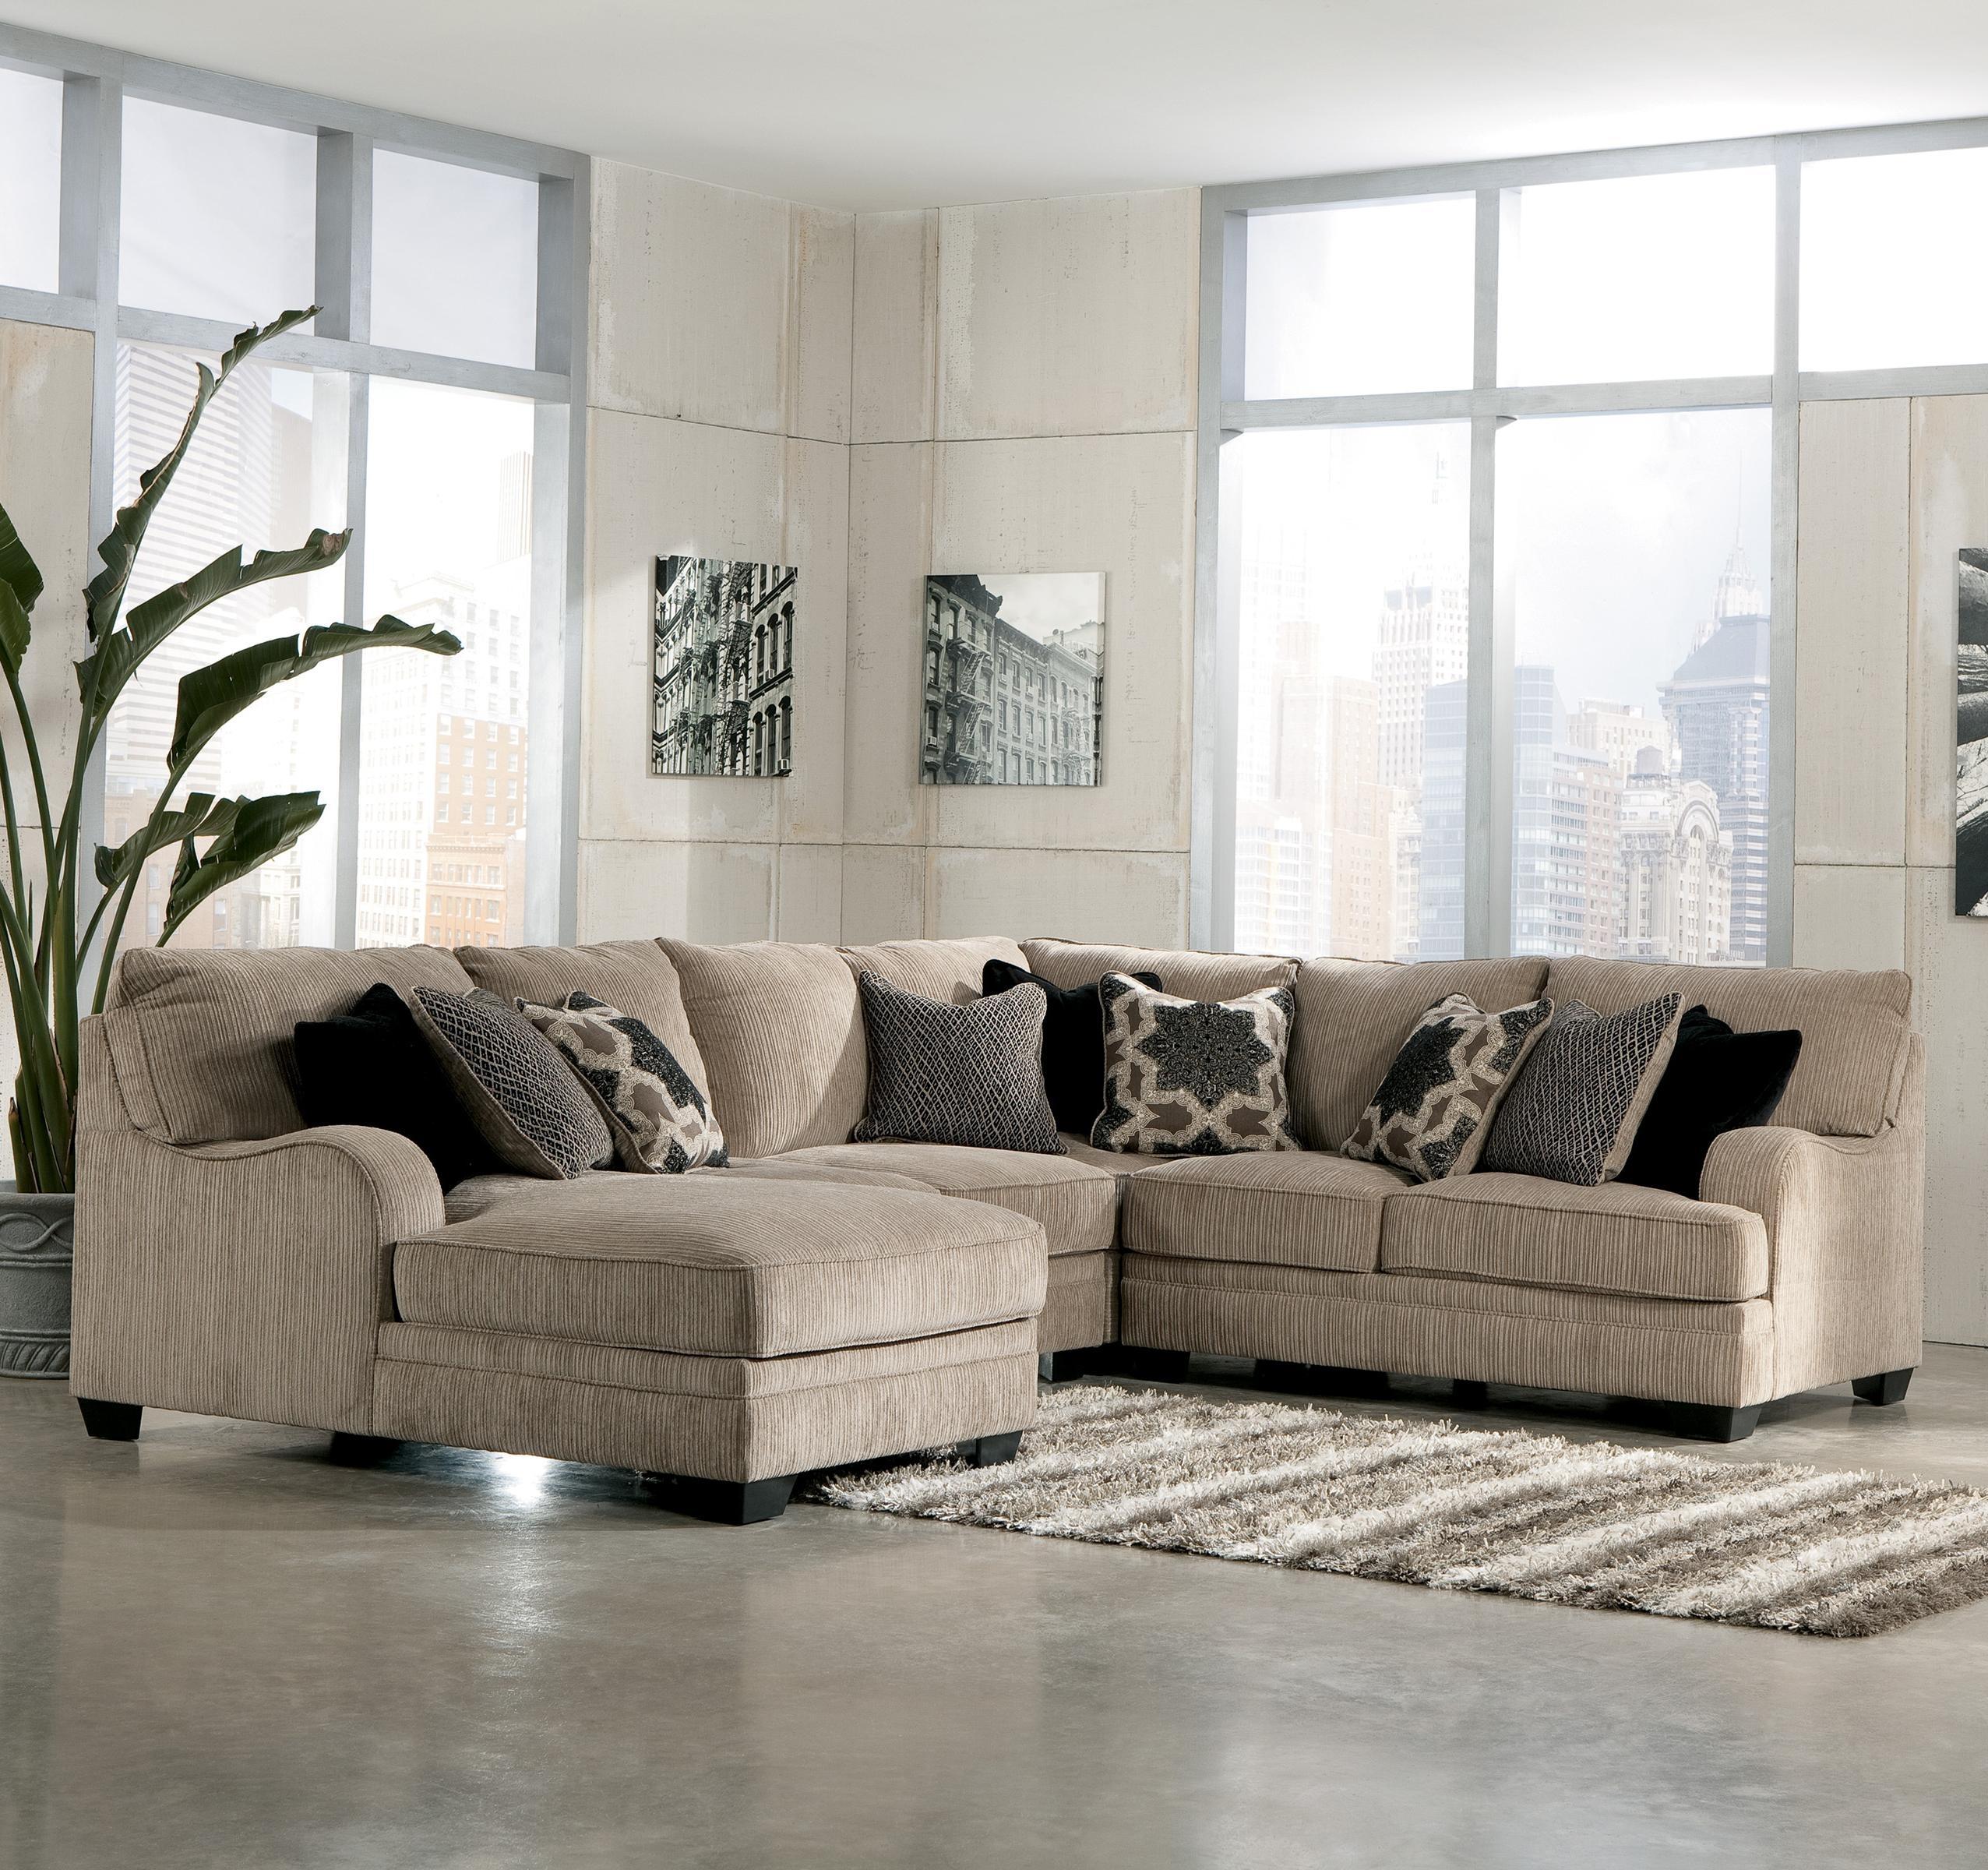 Signature Designashley Katisha – Platinum 4 Piece Sectional Sofa Pertaining To Peterborough Ontario Sectional Sofas (View 8 of 10)